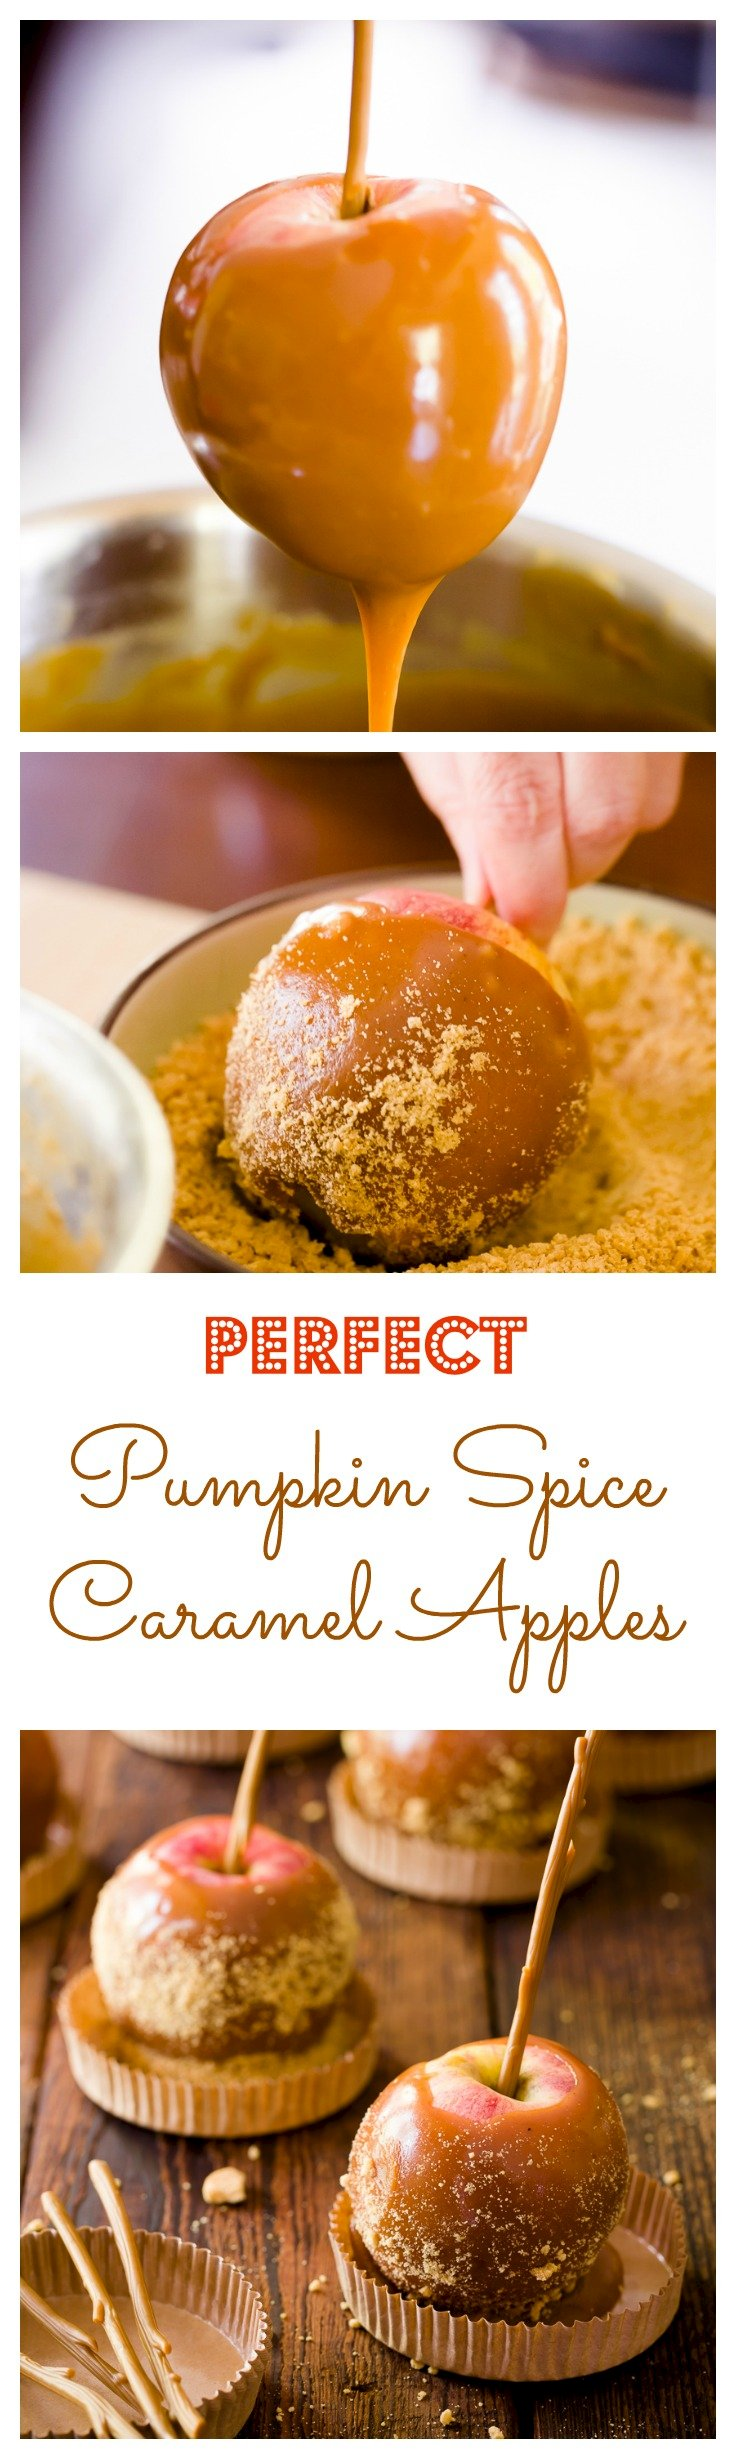 Perfect Pumpkin Spice Caramel Apples